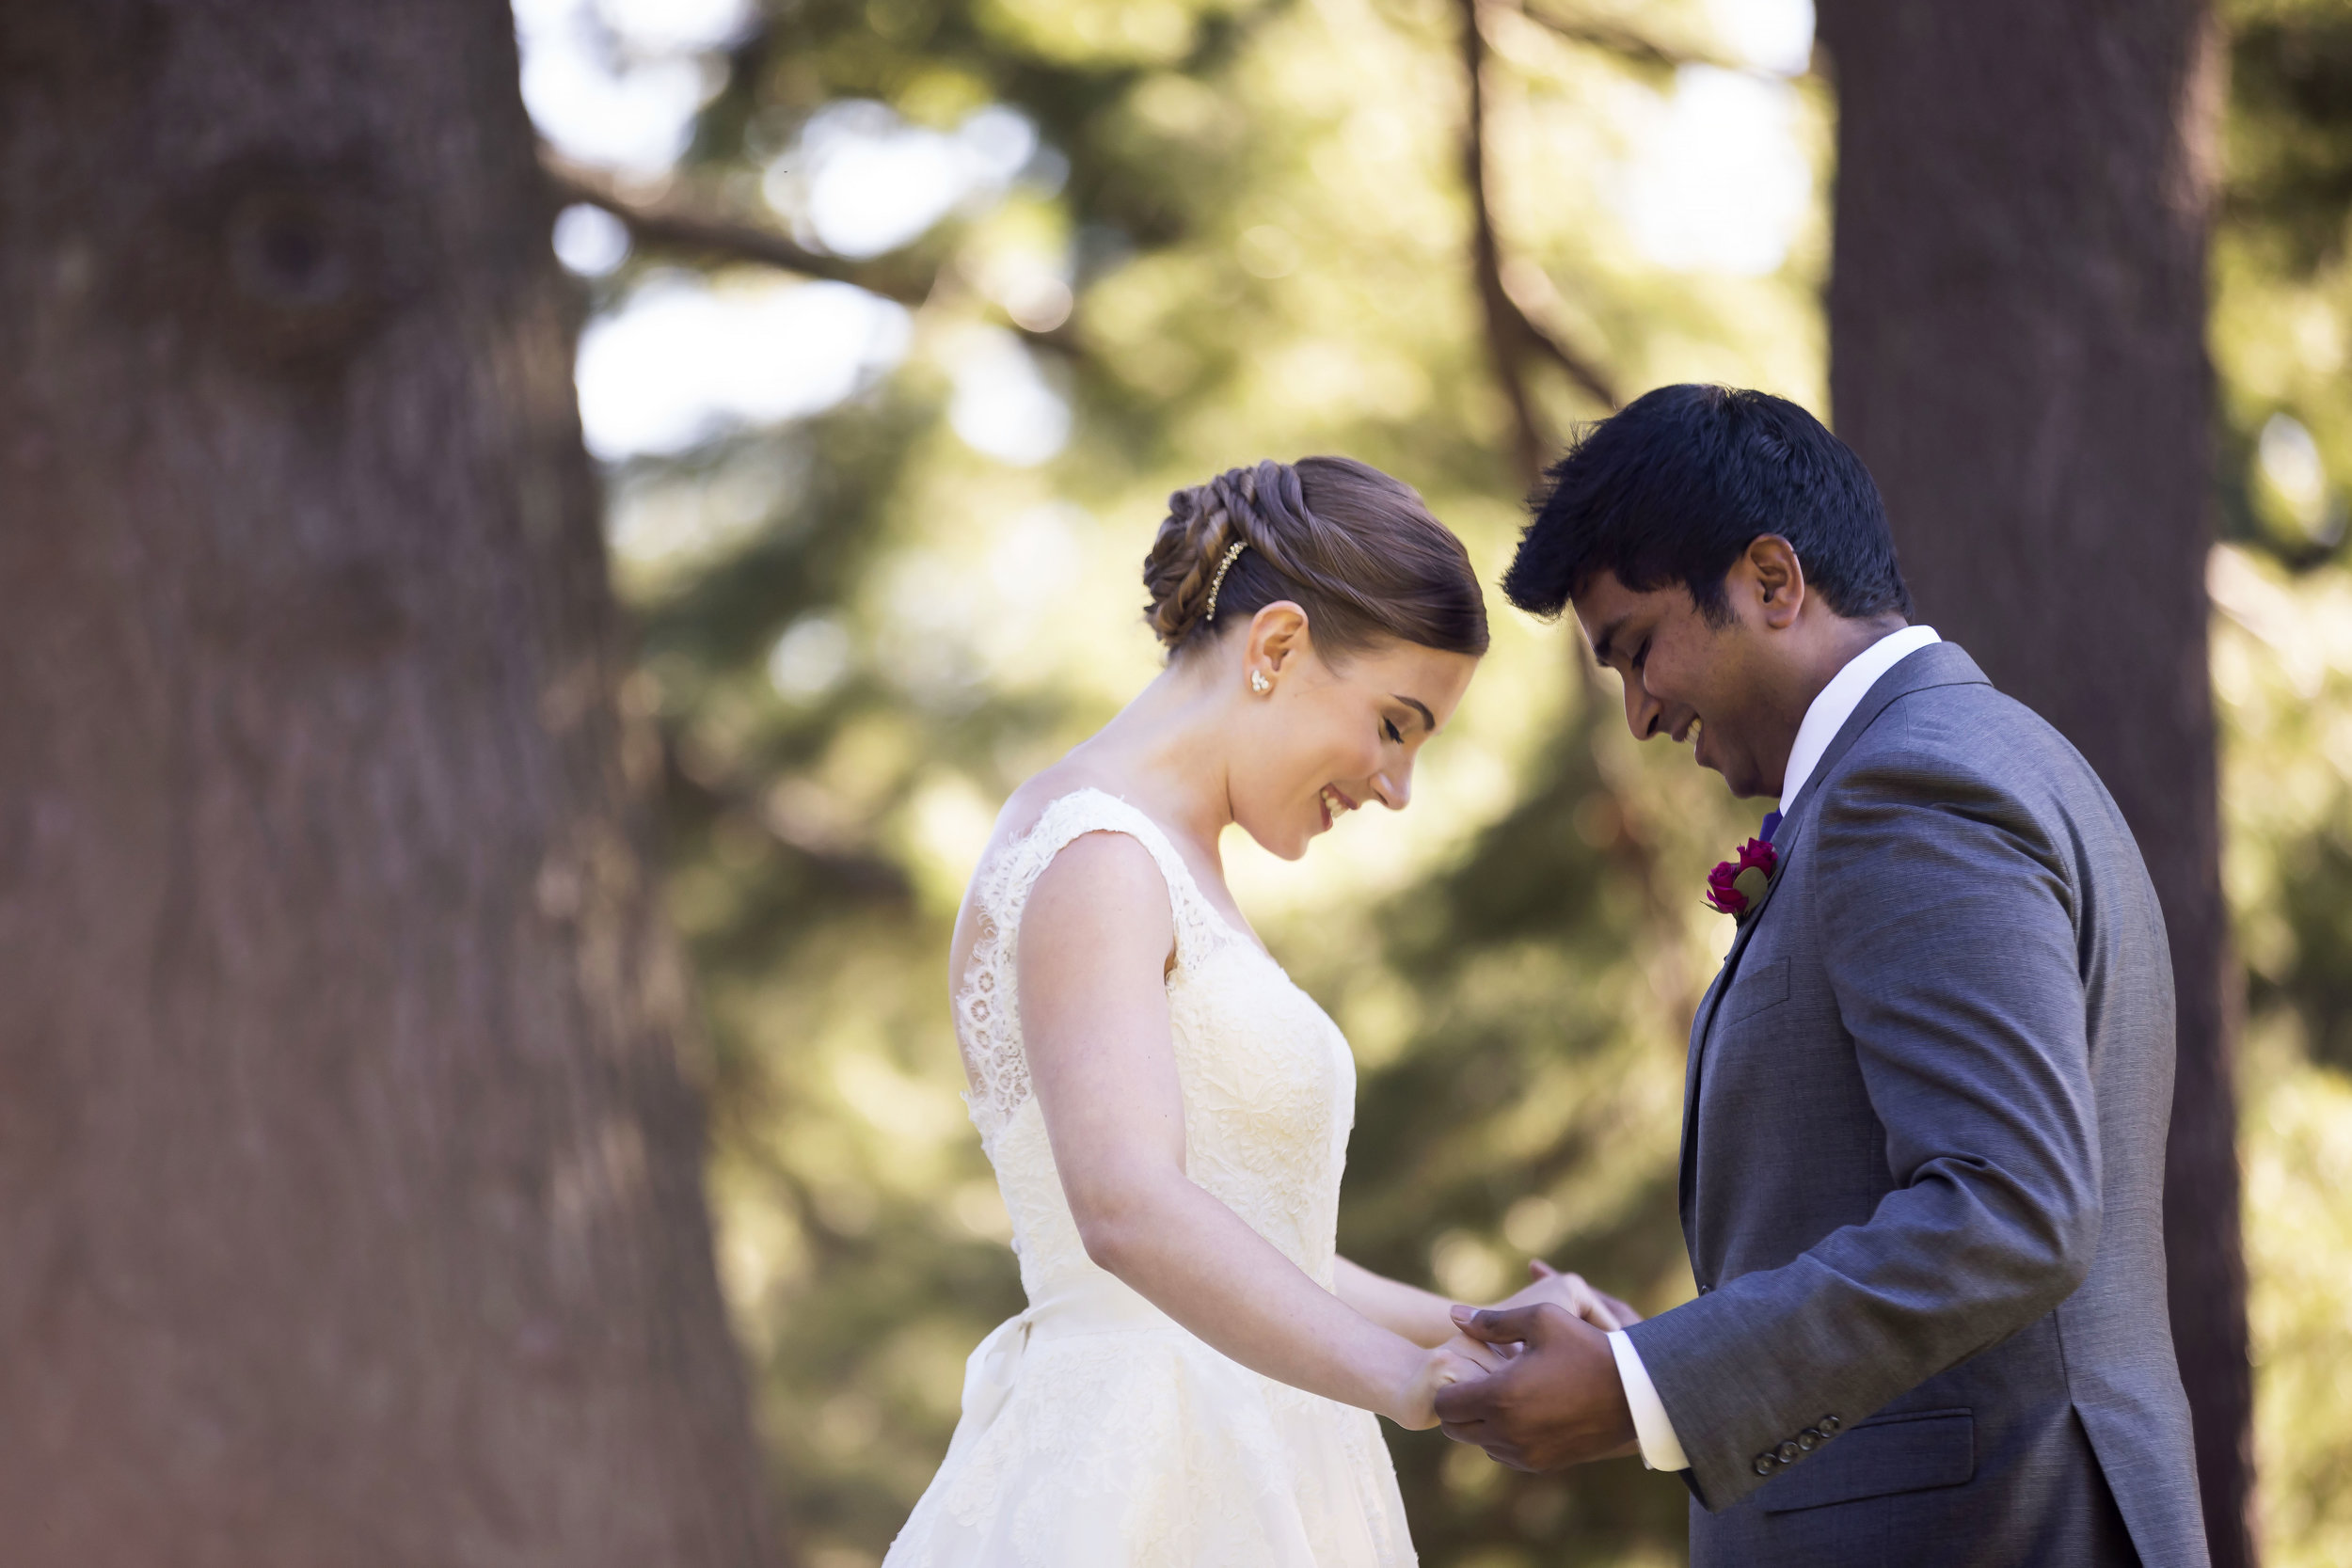 Tappan-Hill-Wedding-Photographer-0026.JPG